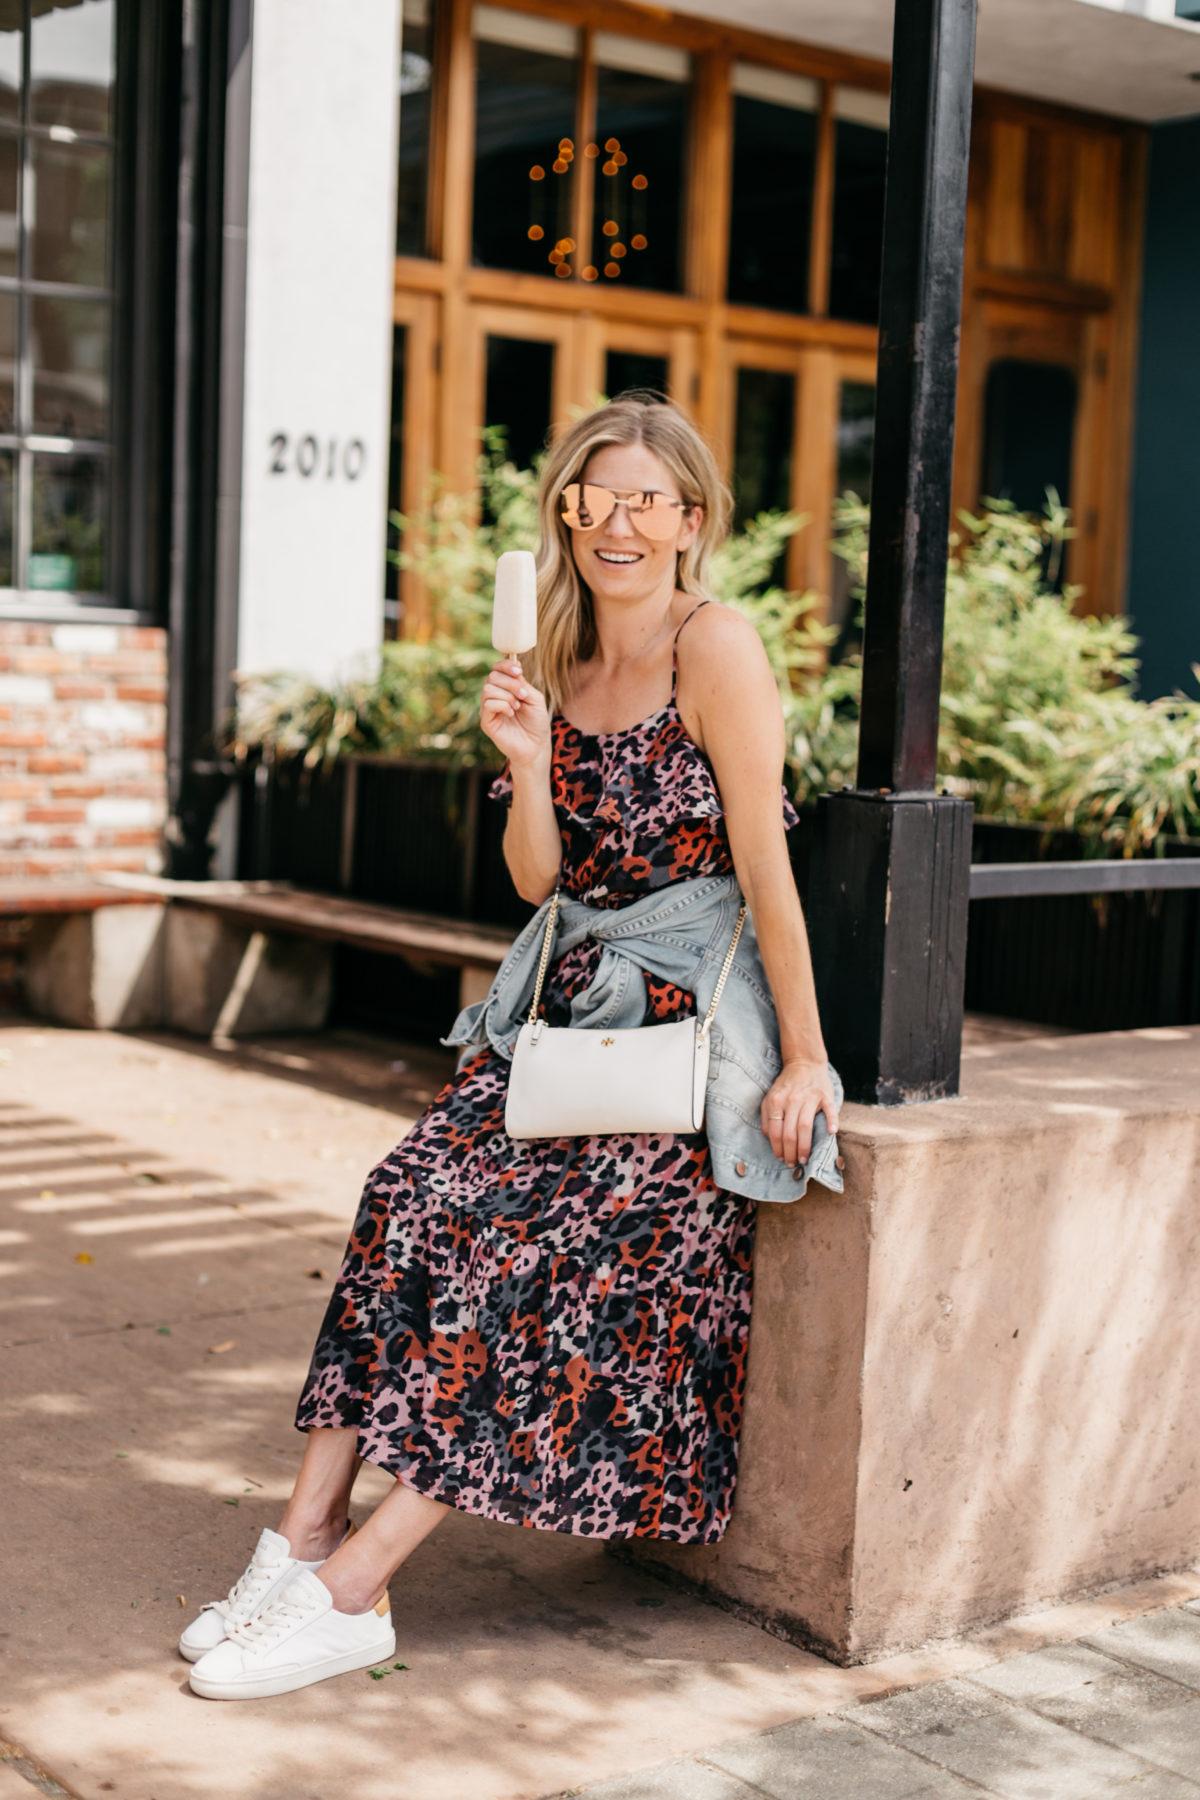 Spring Fashion 2019 - Floral Dress